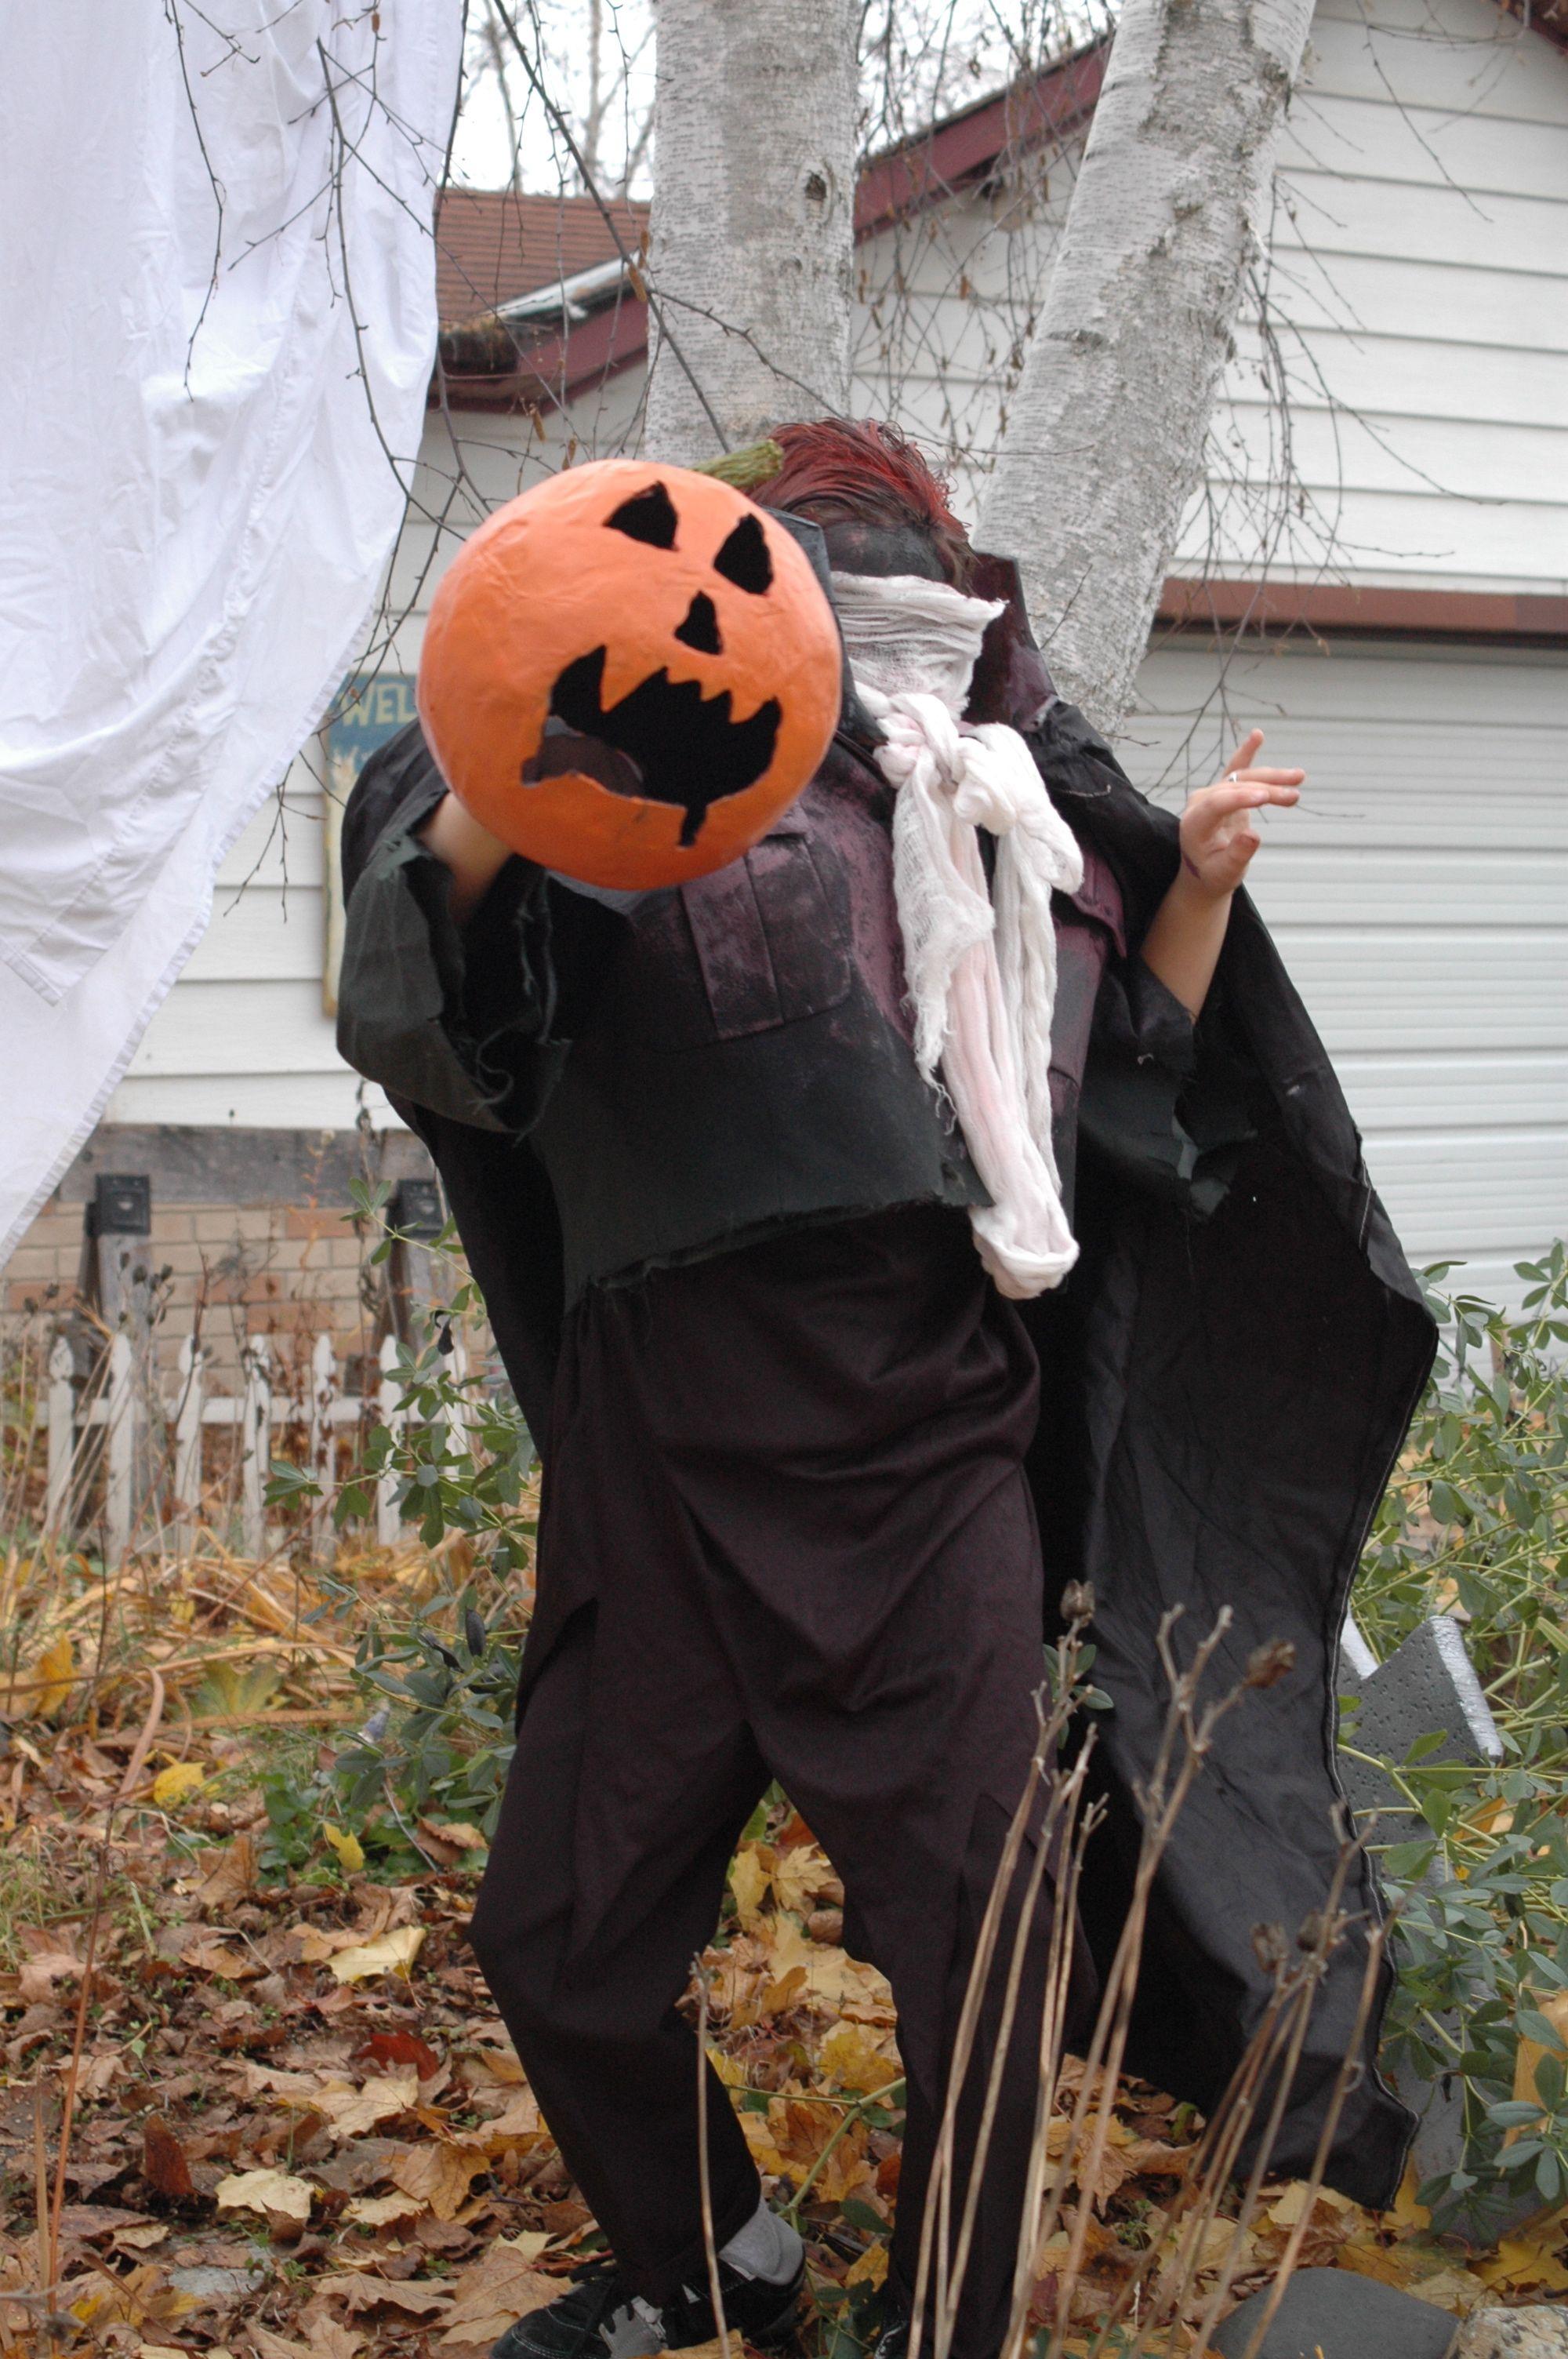 headless horseman costume halloween comiccon costumes diy halloween headless horseman costume - Sleepy Hollow Halloween Costumes